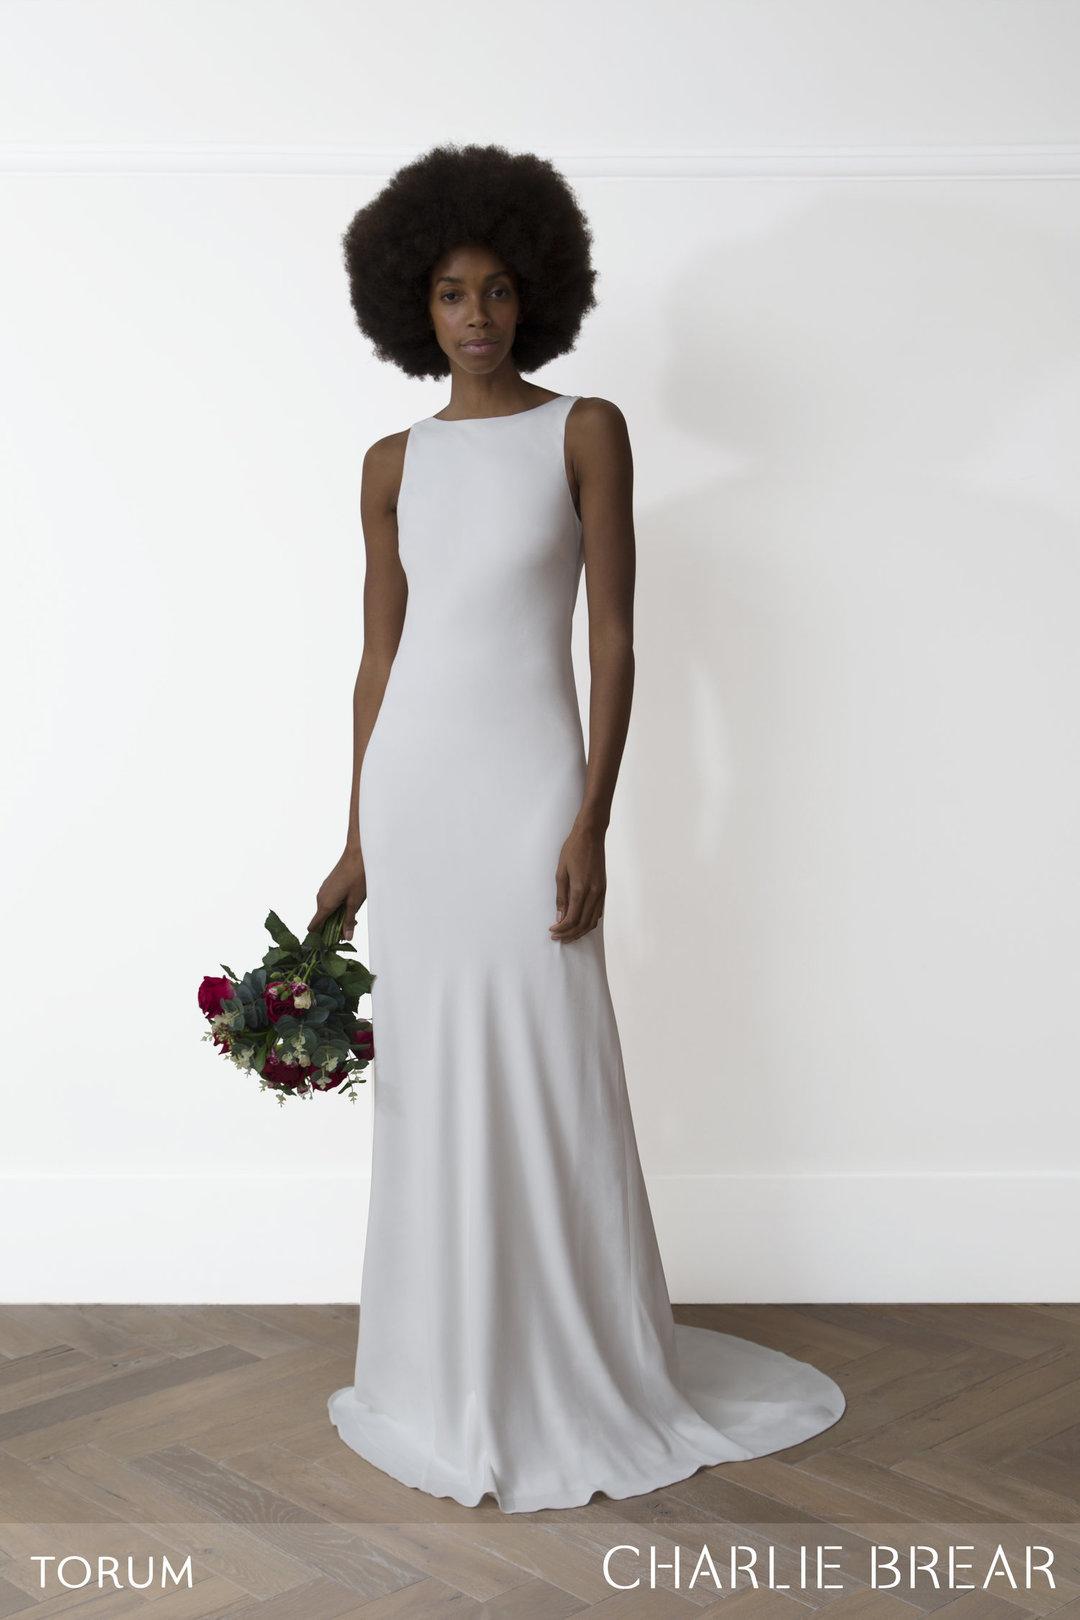 torum dress photo